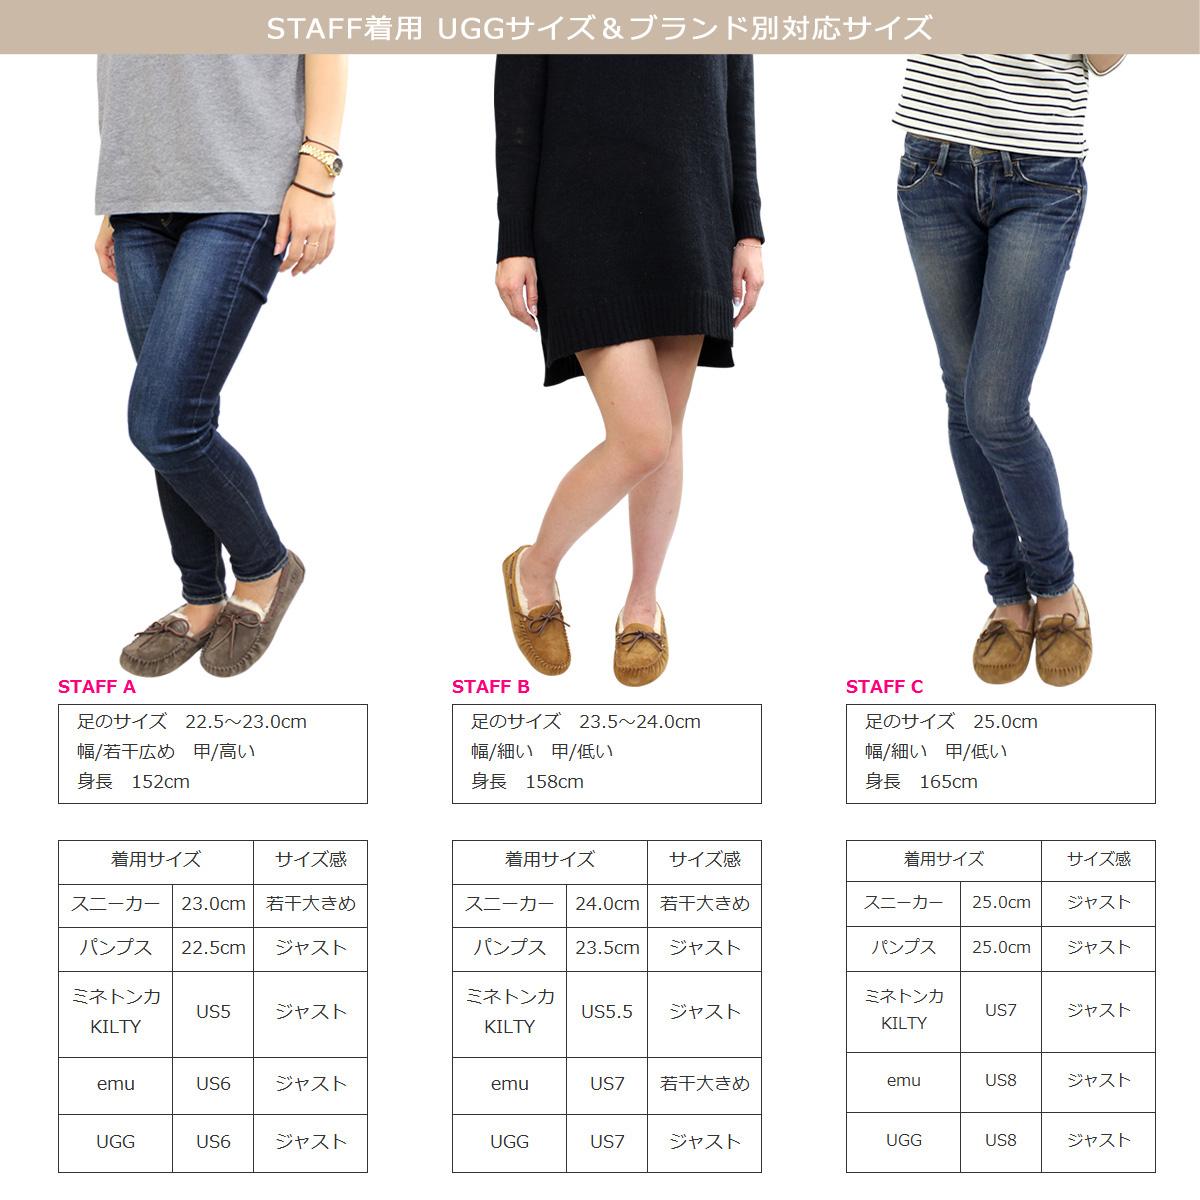 39% ☆ UGG UGG women's Dakota moccasin footwear 5612 W DAKOTA WOMENS 1001631 Womens FALL 2013 new Mouton Sheepskin